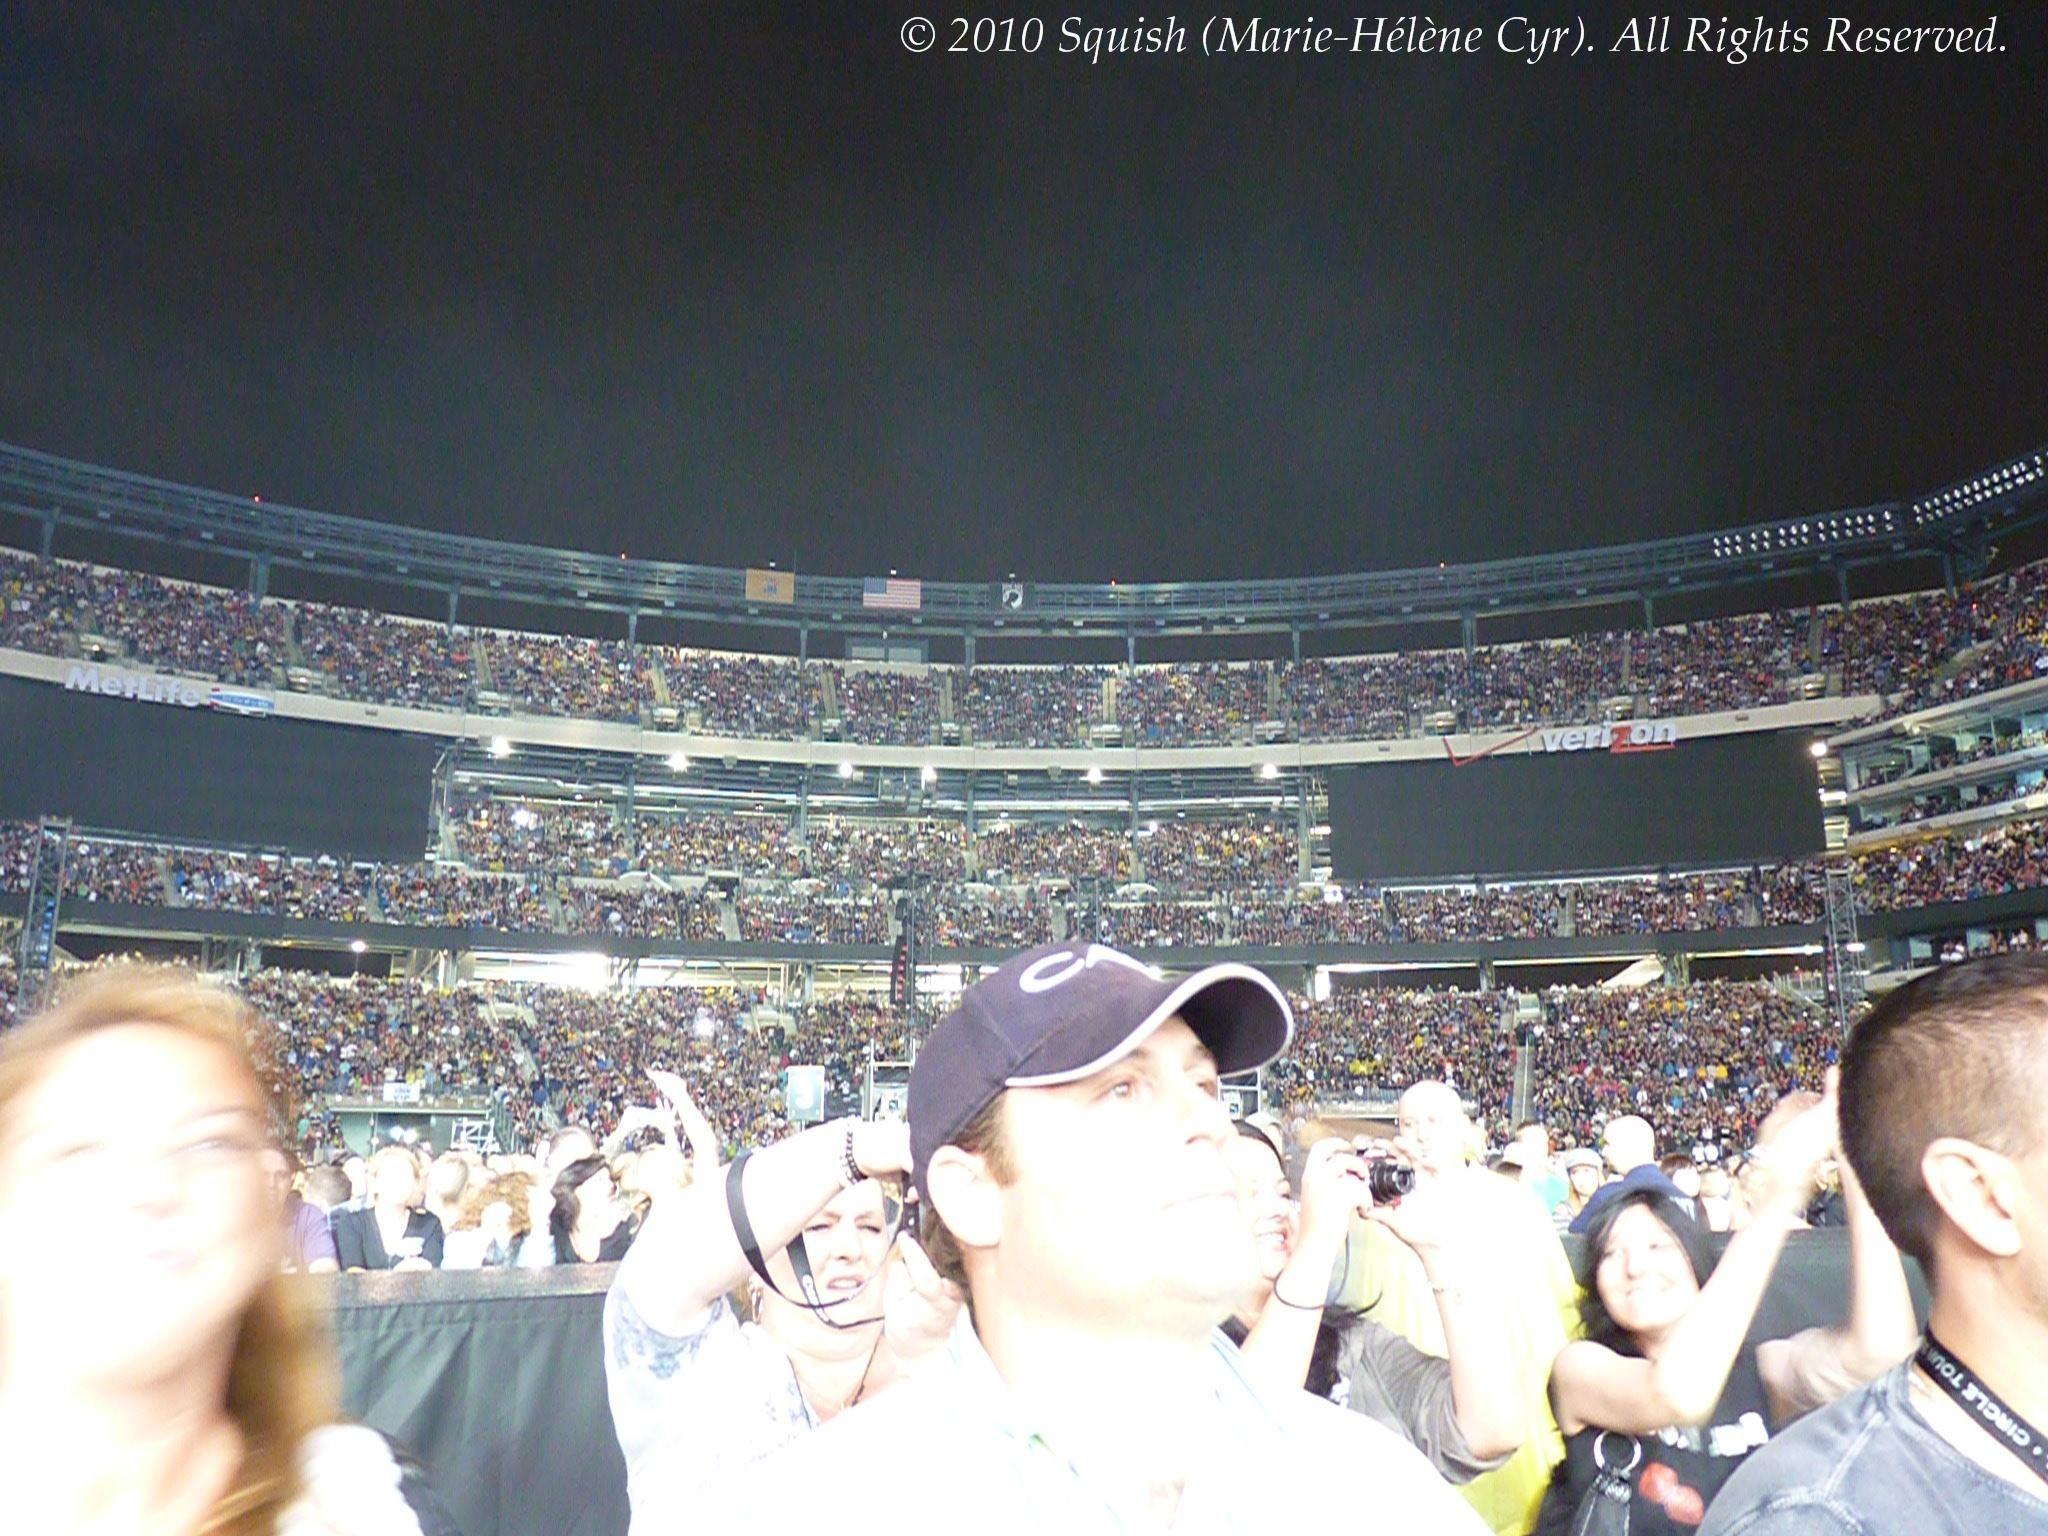 Bon Jovi show at the New Meadowlands Stadium, NJ, USA (May 27, 2010)